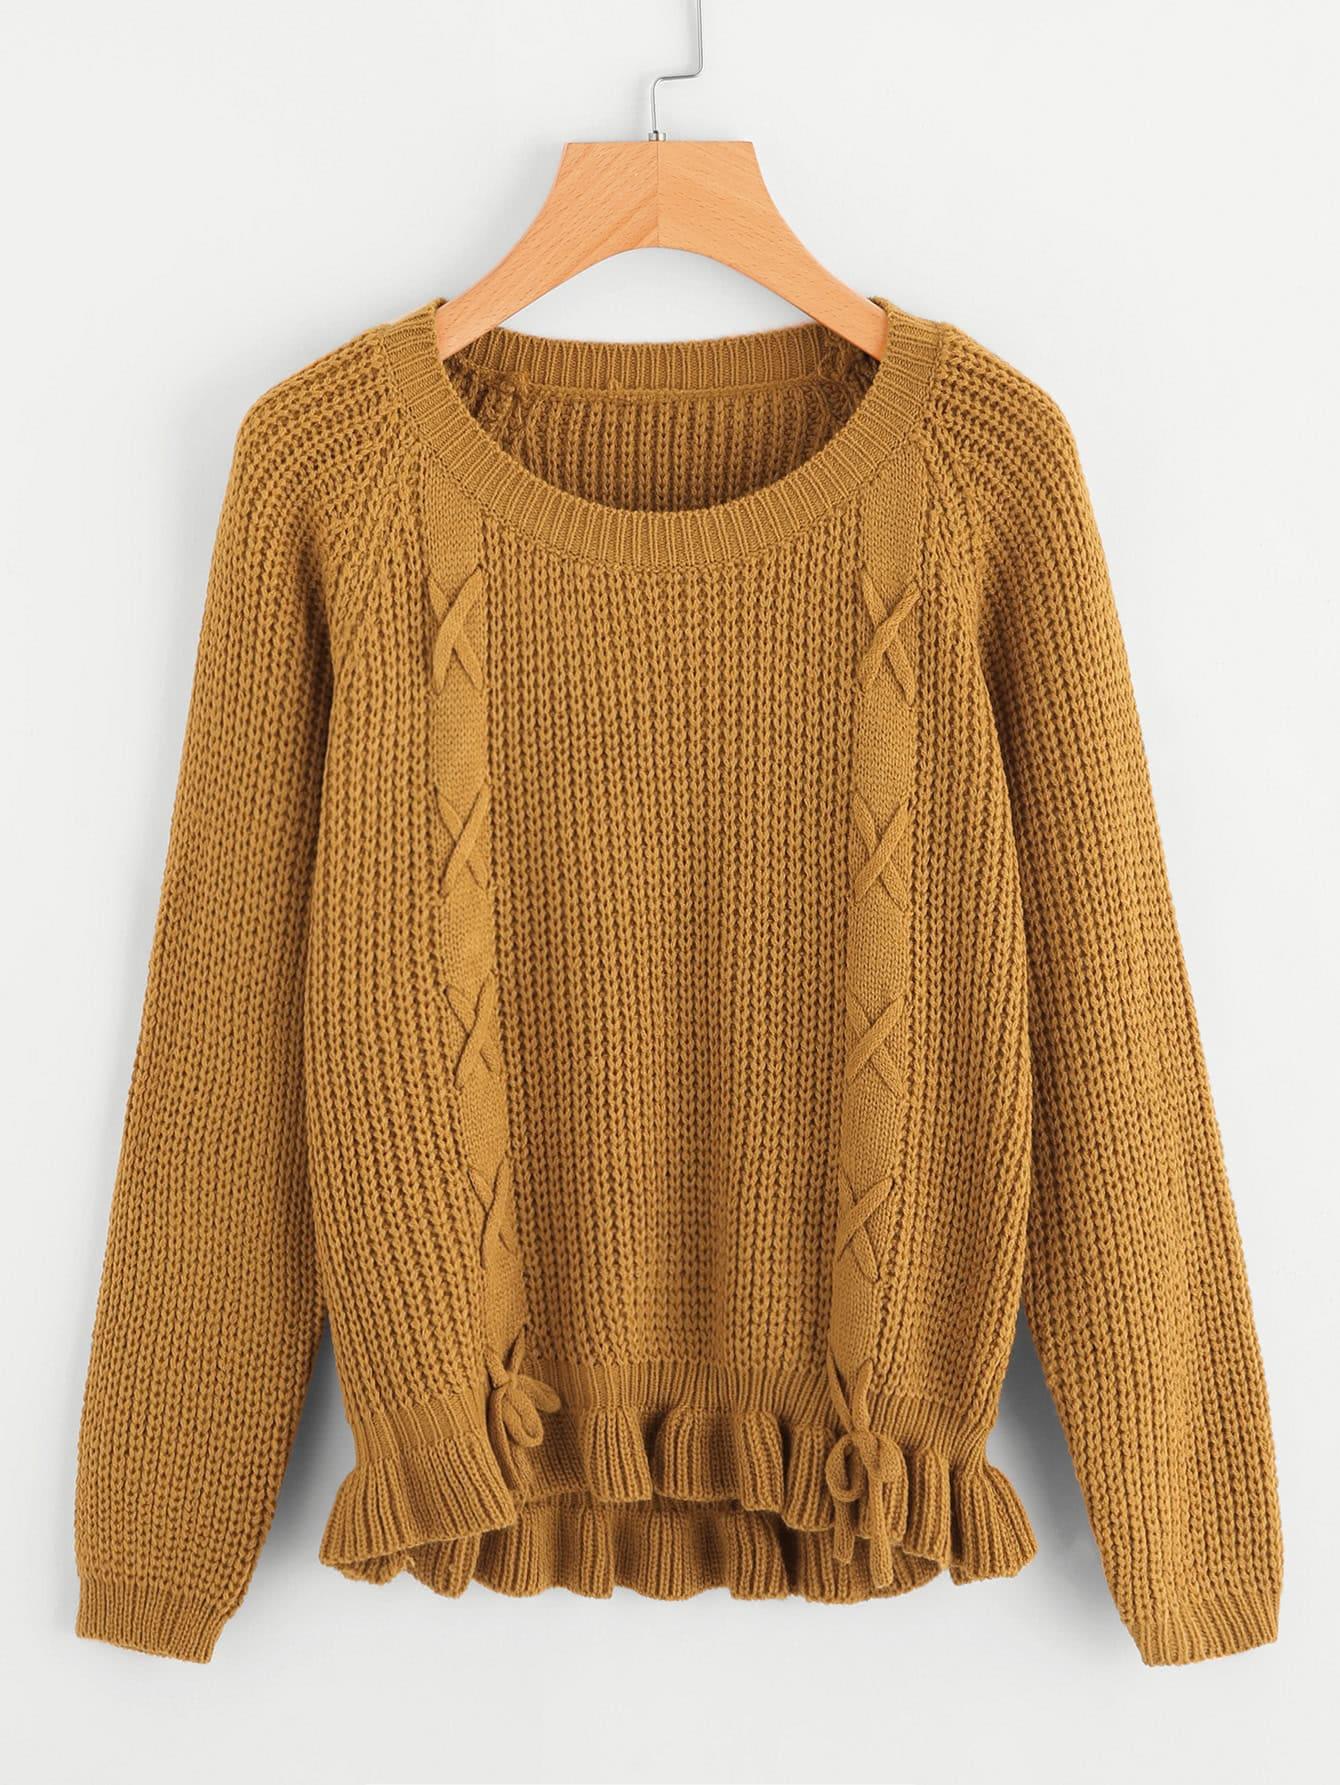 Frill Hem Lace Up Textured Knit Jumper sweater170918113